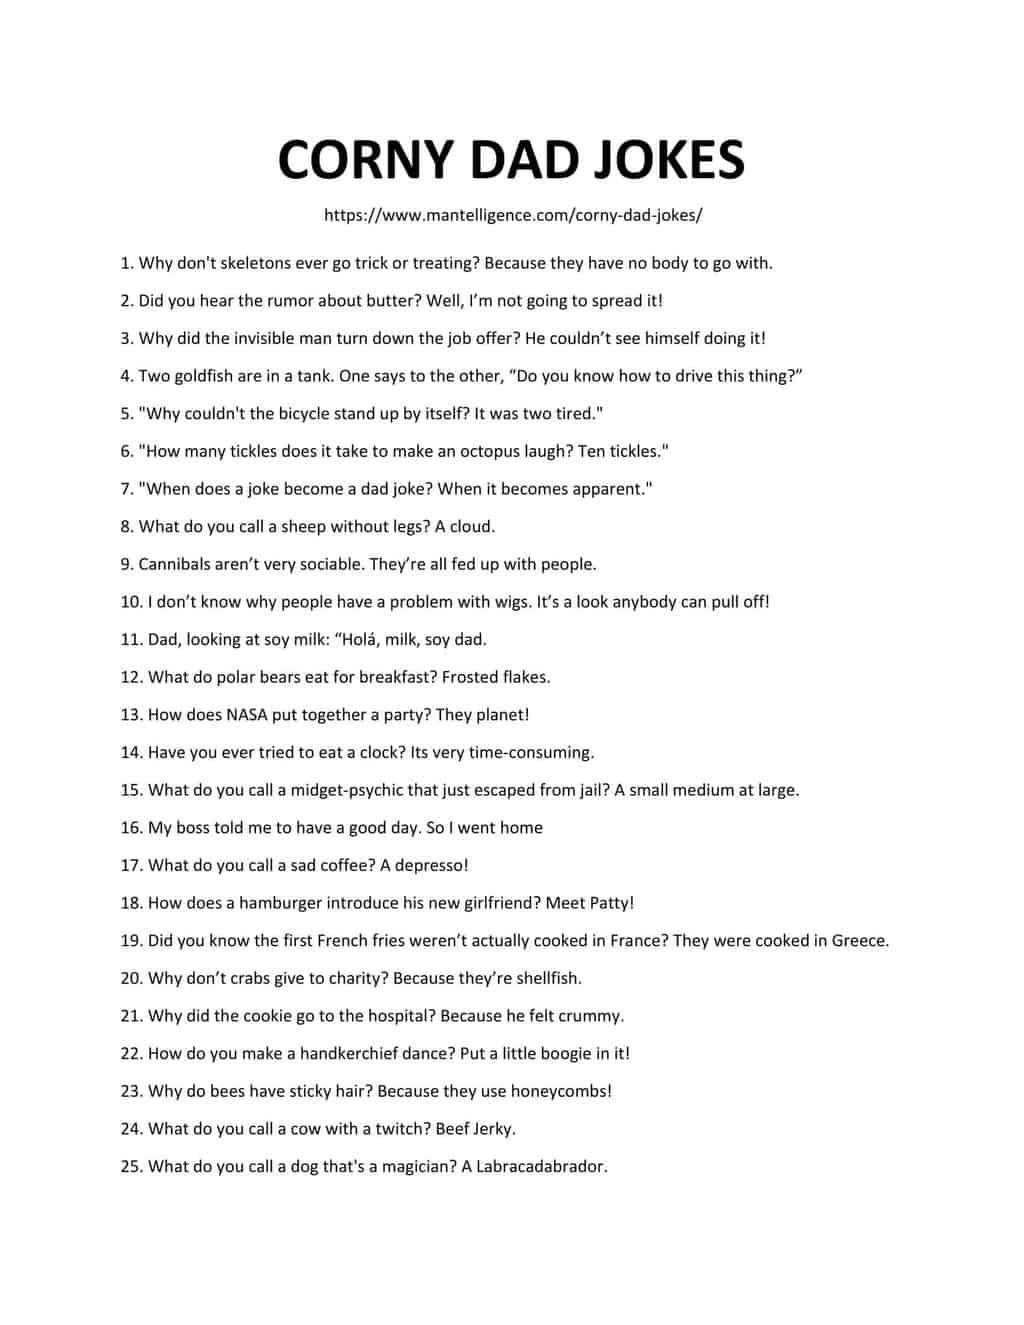 list of corny dad jokes-1